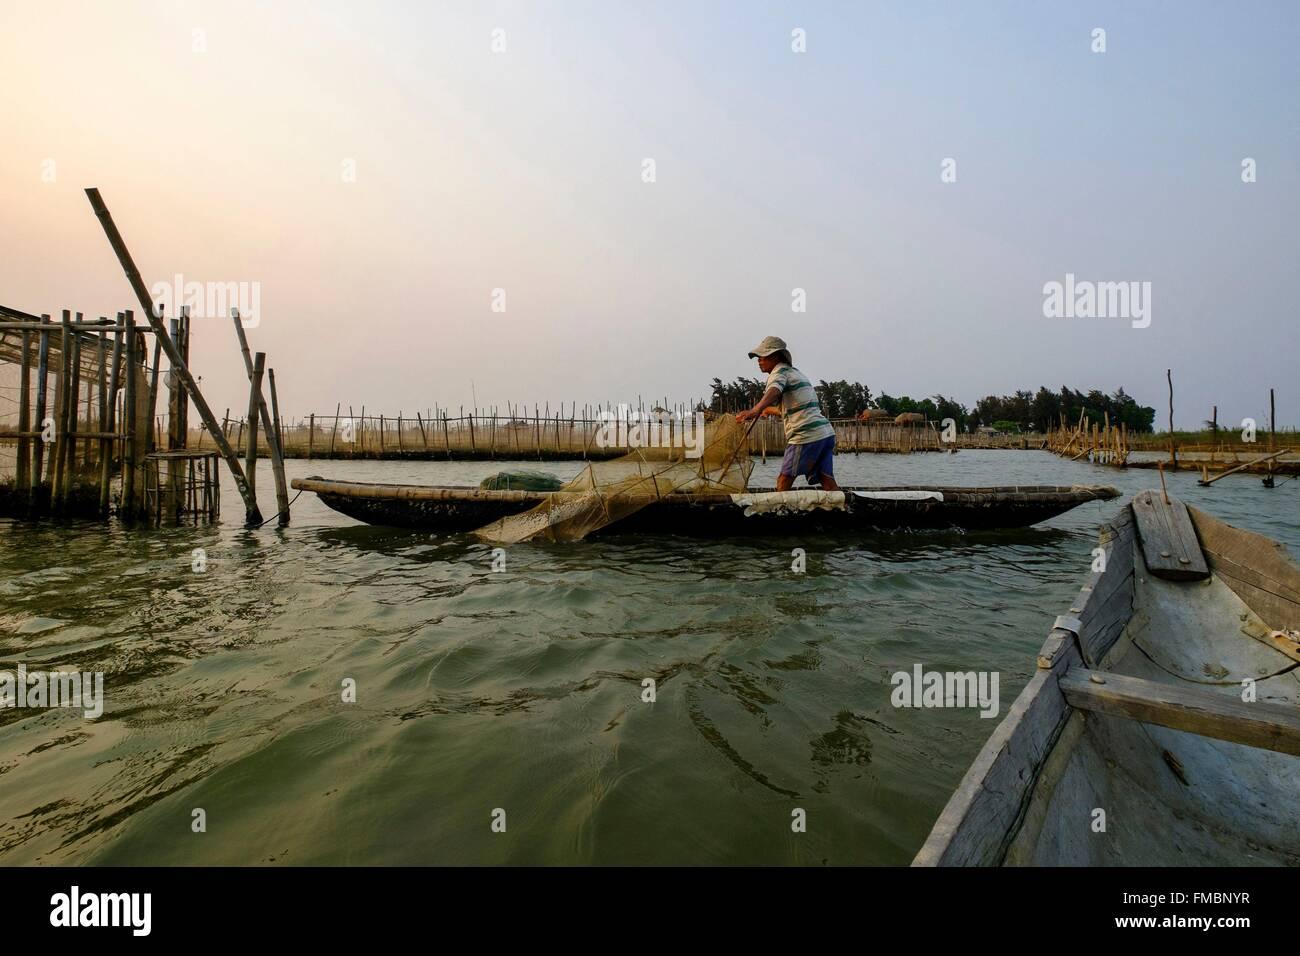 Vietnam, Thua Thien Hue province, Hue, Tam Gaing lagoon, fisherman setting his nets - Stock Image